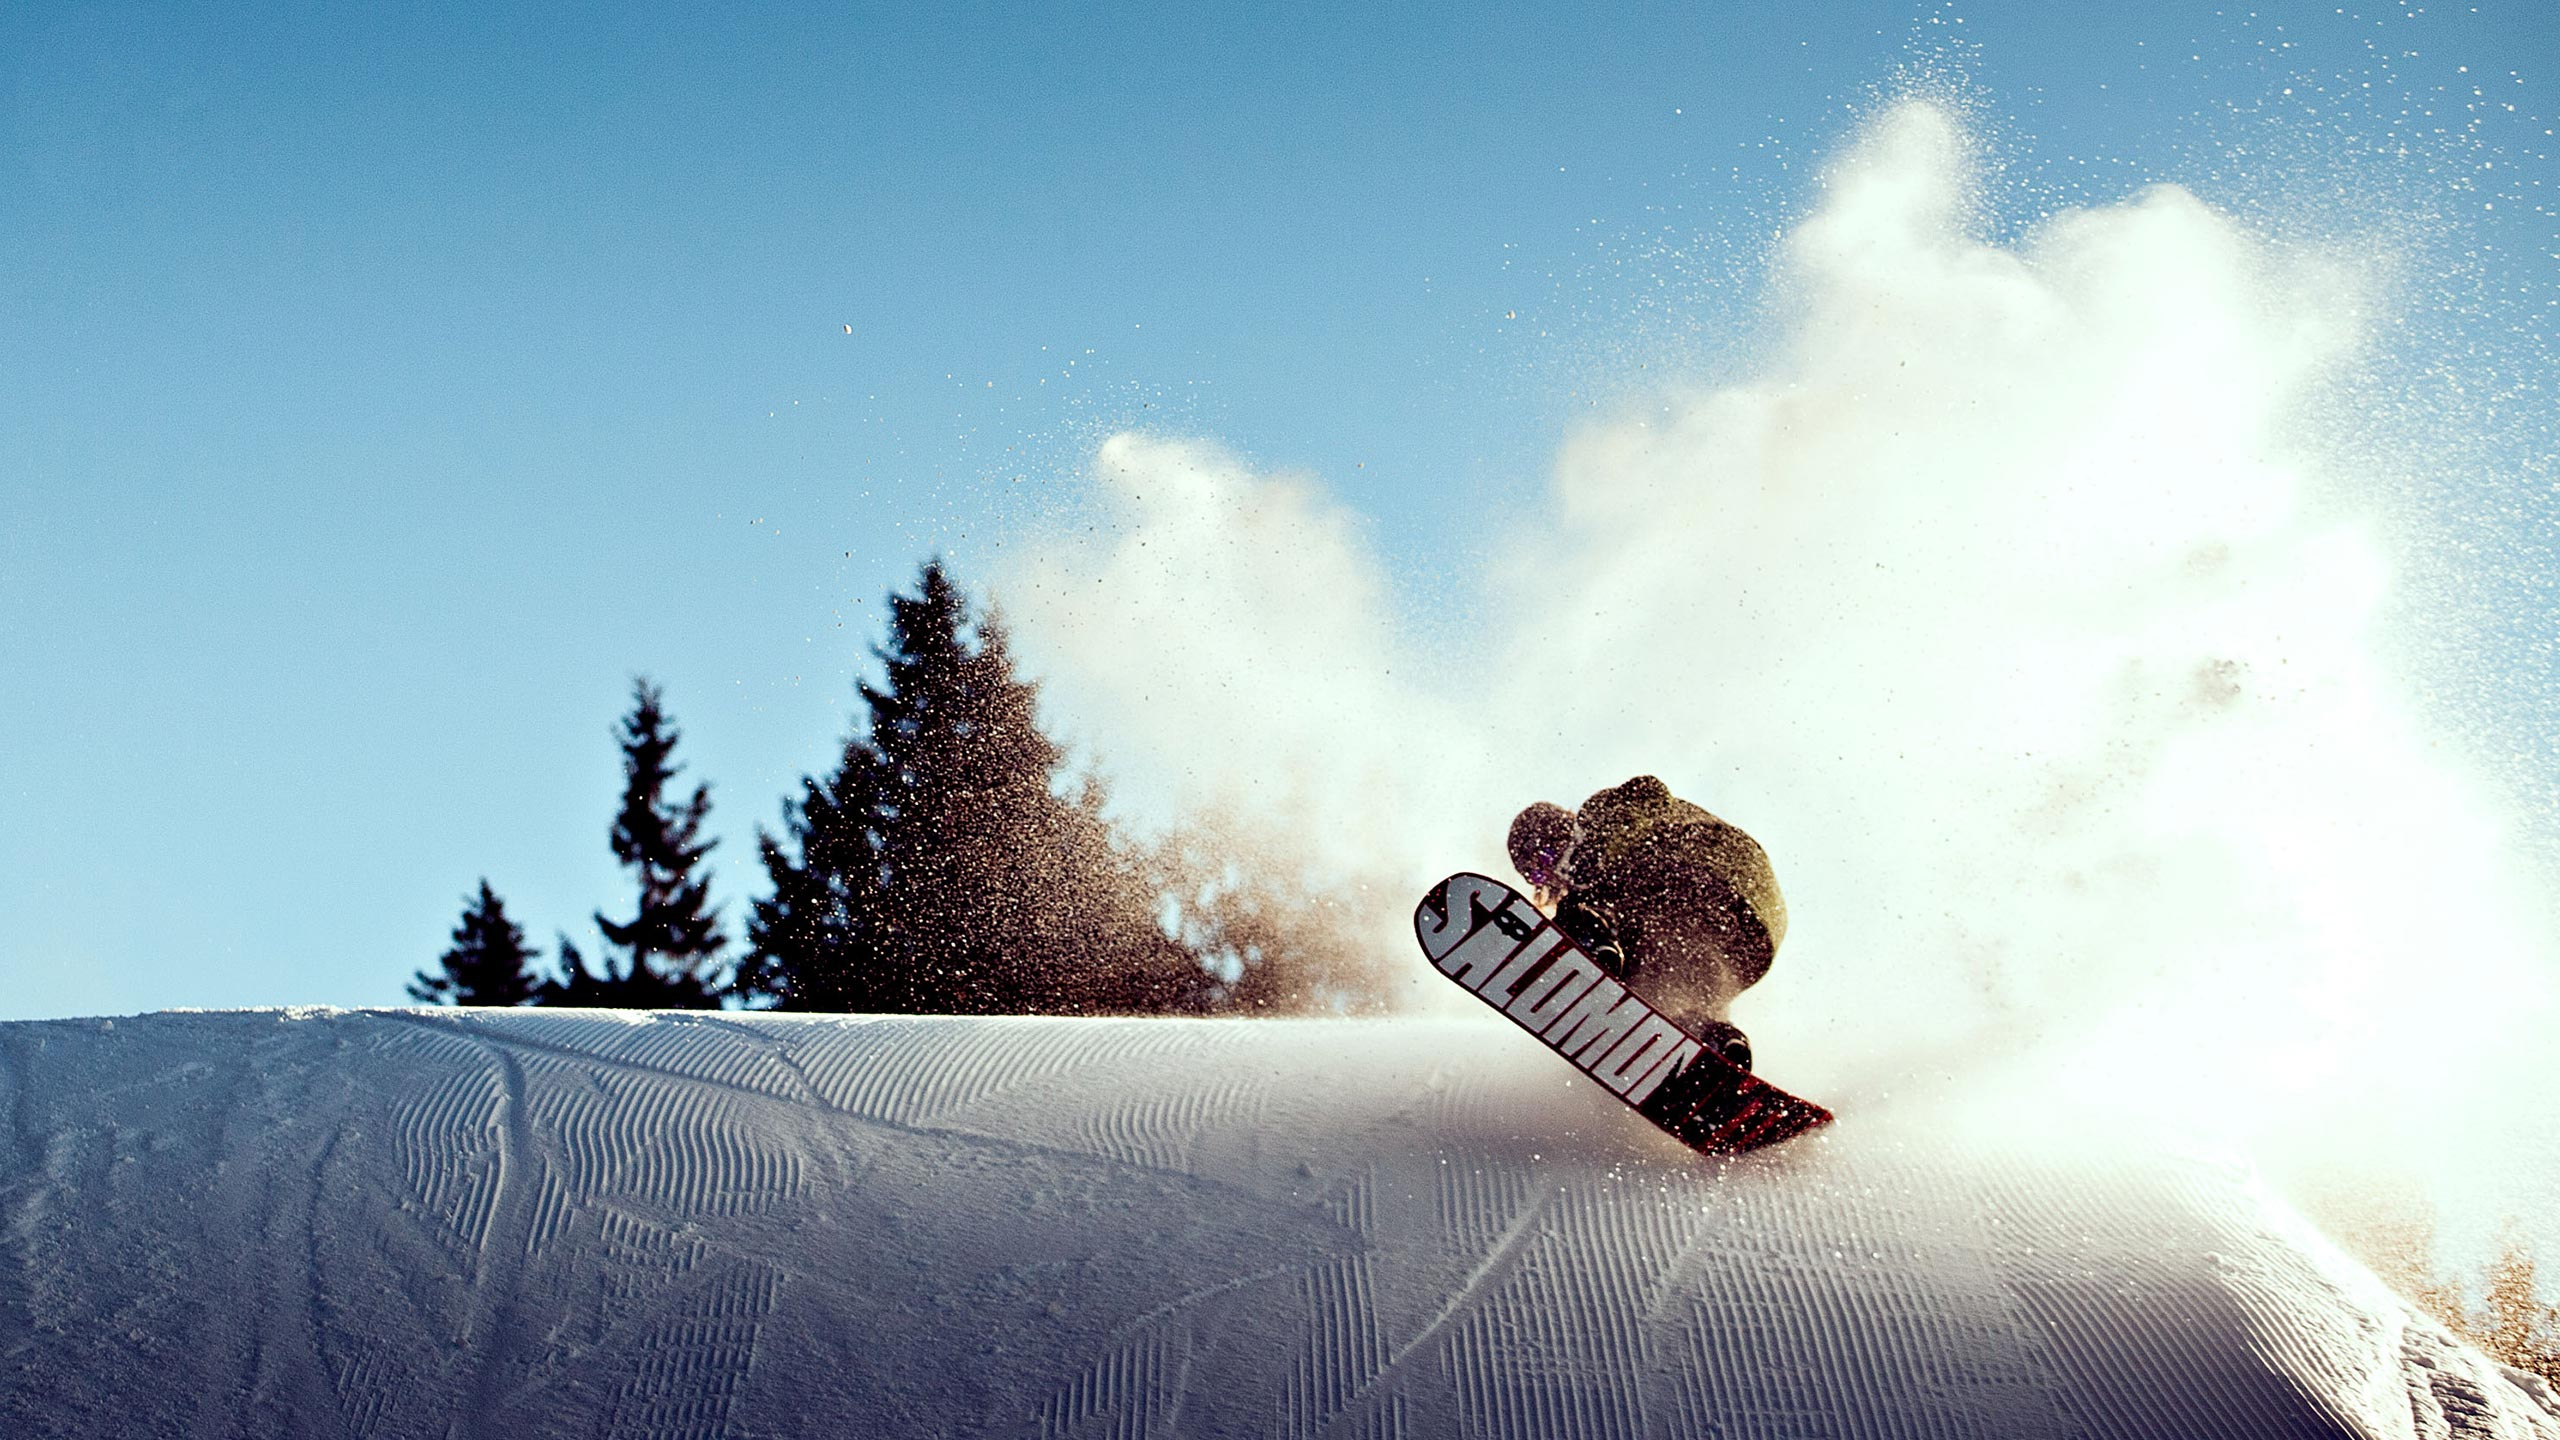 Snowboarding Wallpaper Background Hd 62843 2560x1440px